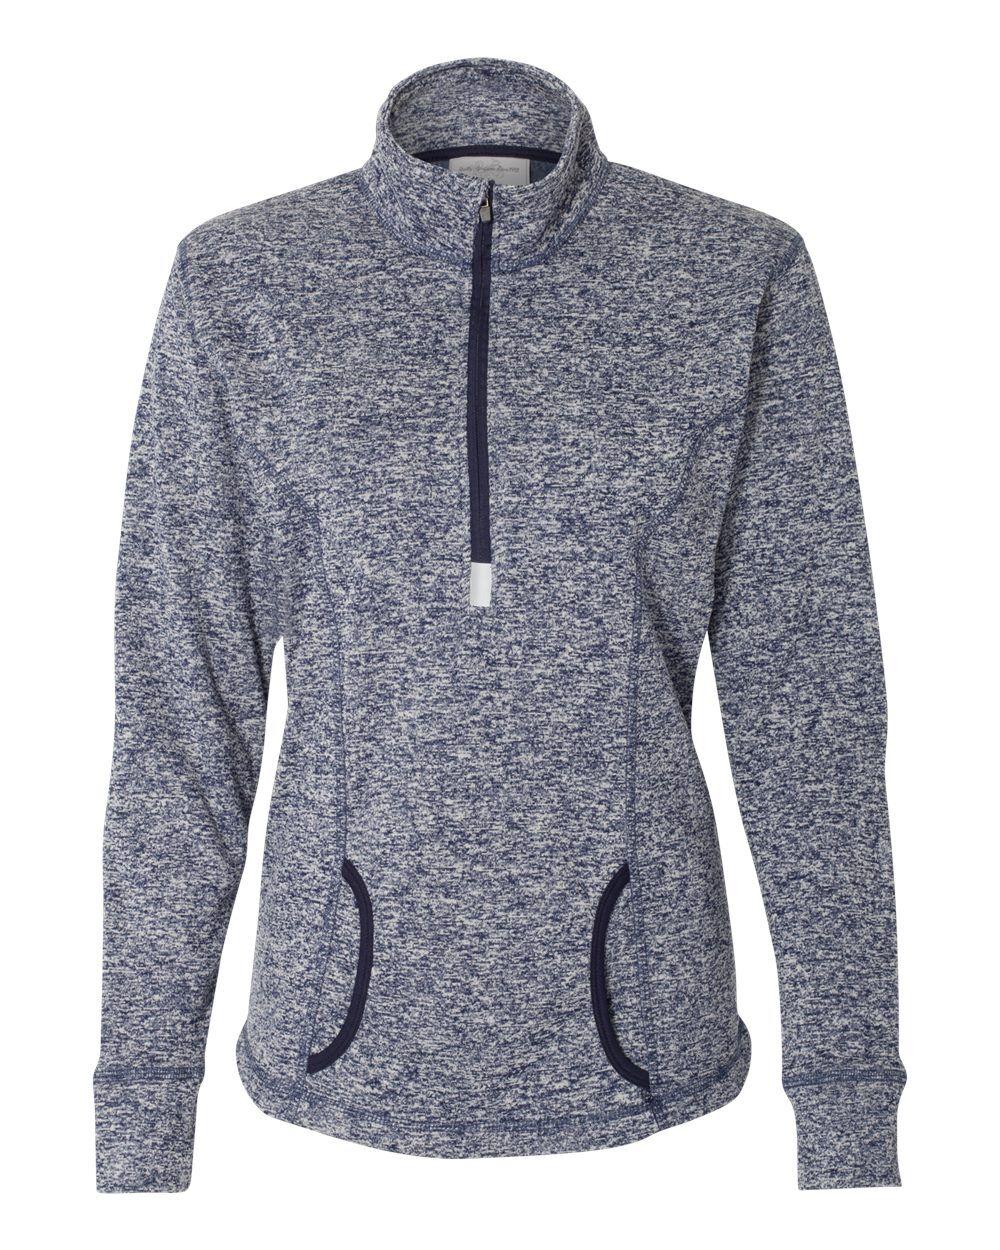 J. America - Women's Cosmic Fleece Quarter-Zip Pullover - 8617 - Navy Fleck/ Navy - Small